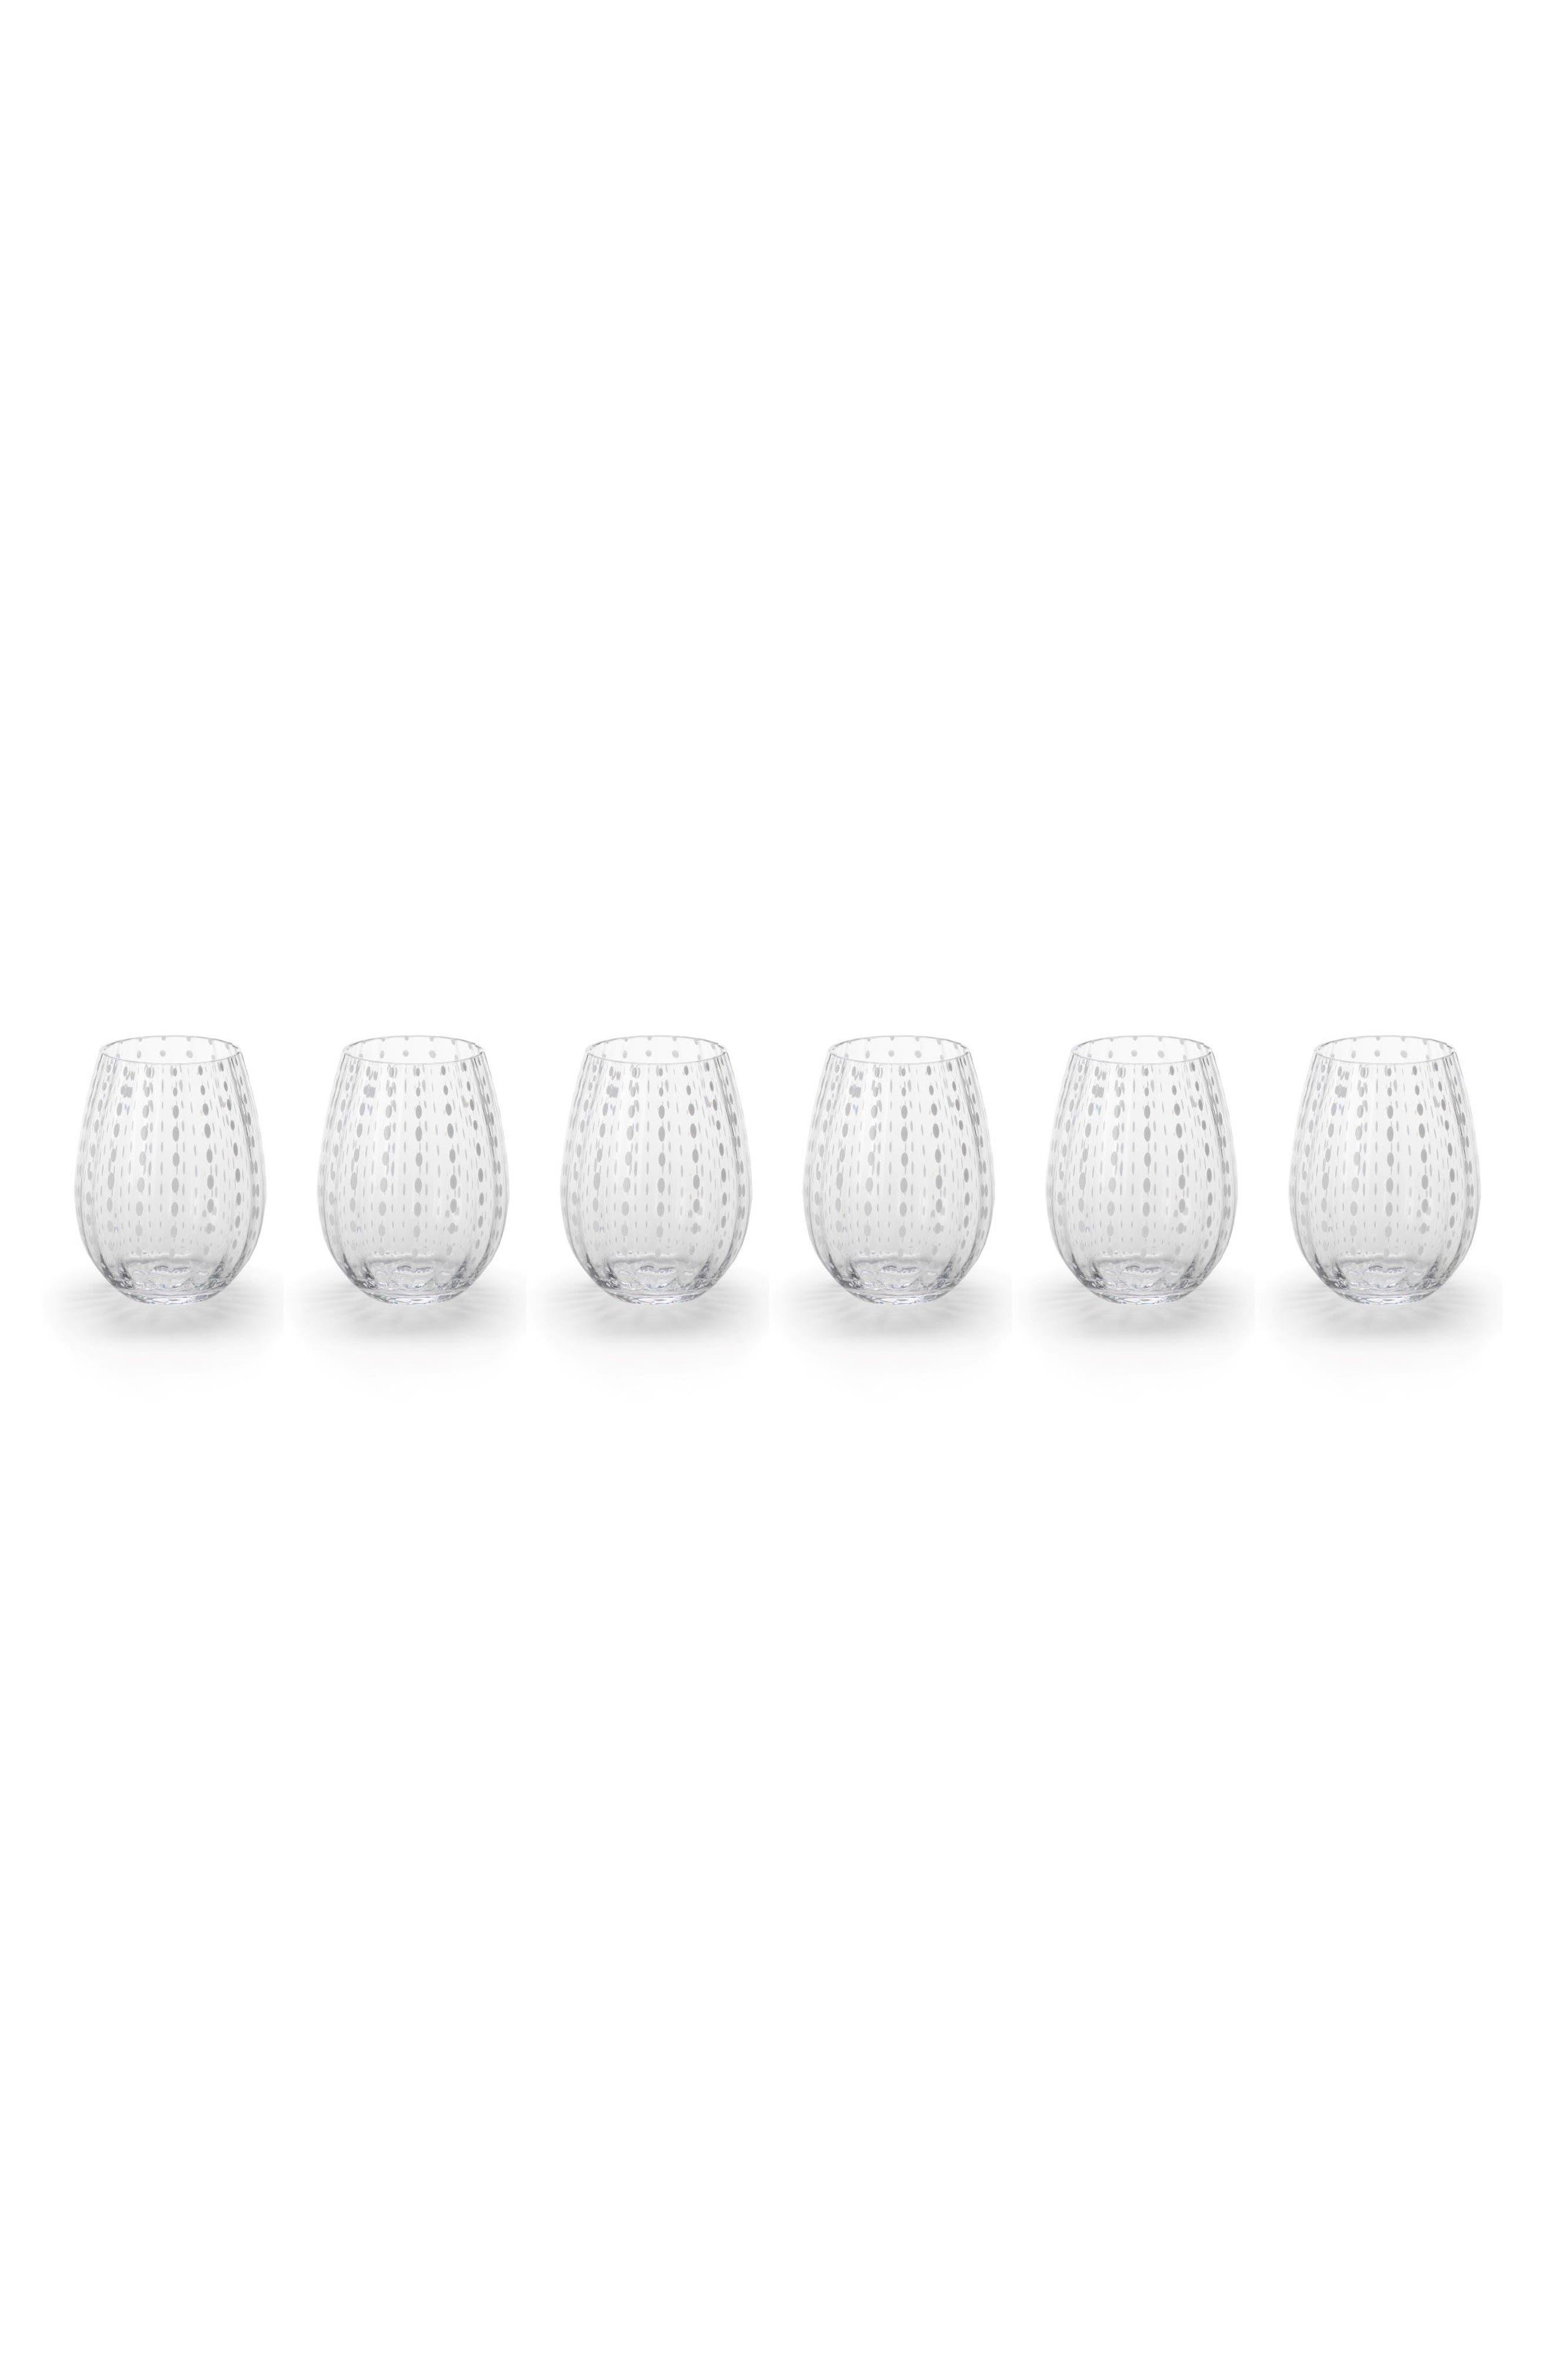 Fintan Set of 6 Stemless Wine Glasses,                             Main thumbnail 1, color,                             White